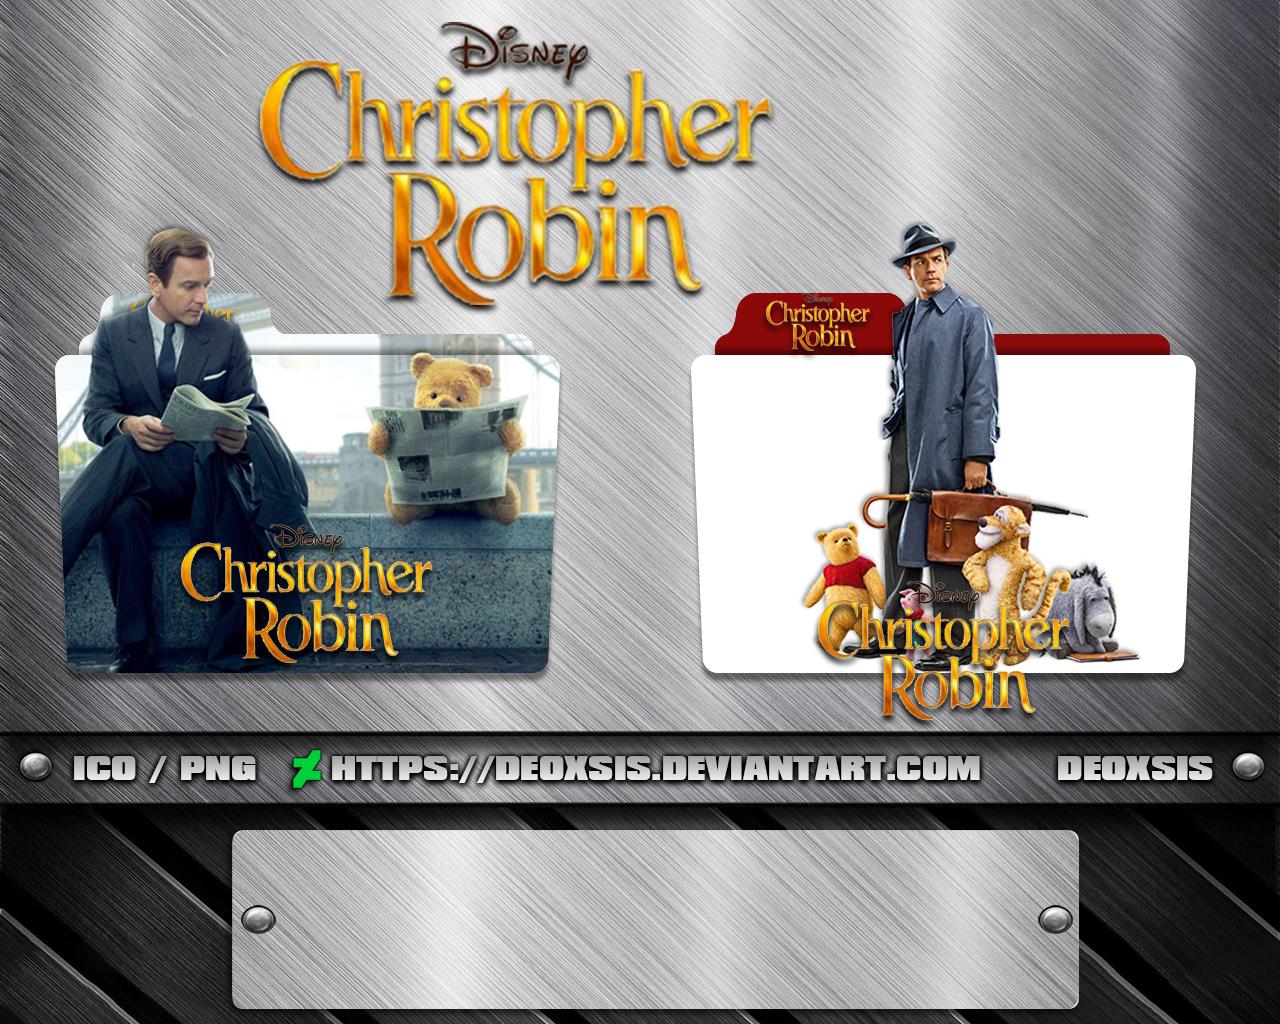 Christopher Robin 2018 Folder Icon Pack By Deoxsis On Deviantart